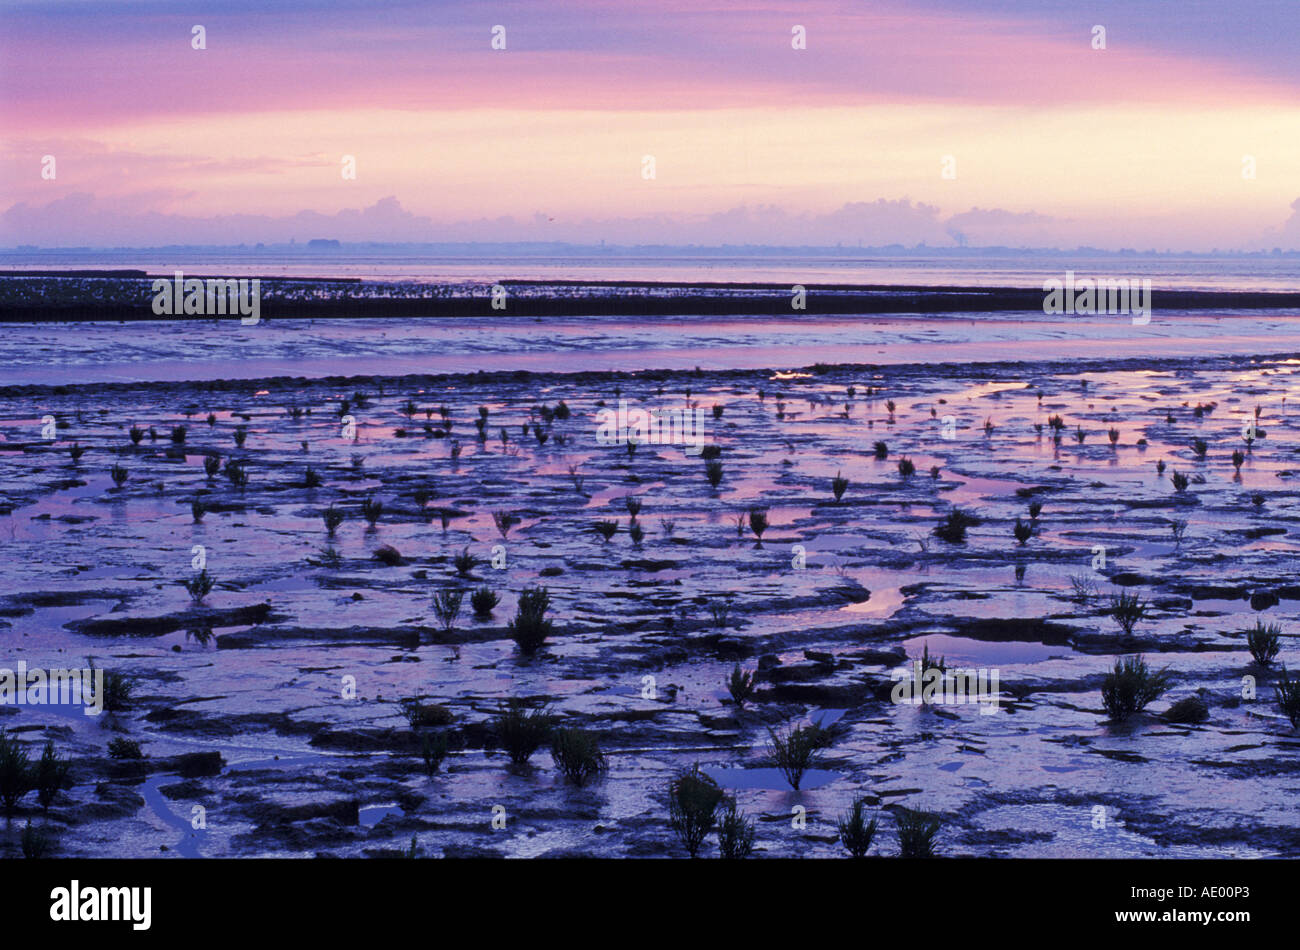 Mit Queller Schlickwatt erodiert Abendstimmung Jadebusen NP Wattenmeer Imagen De Stock